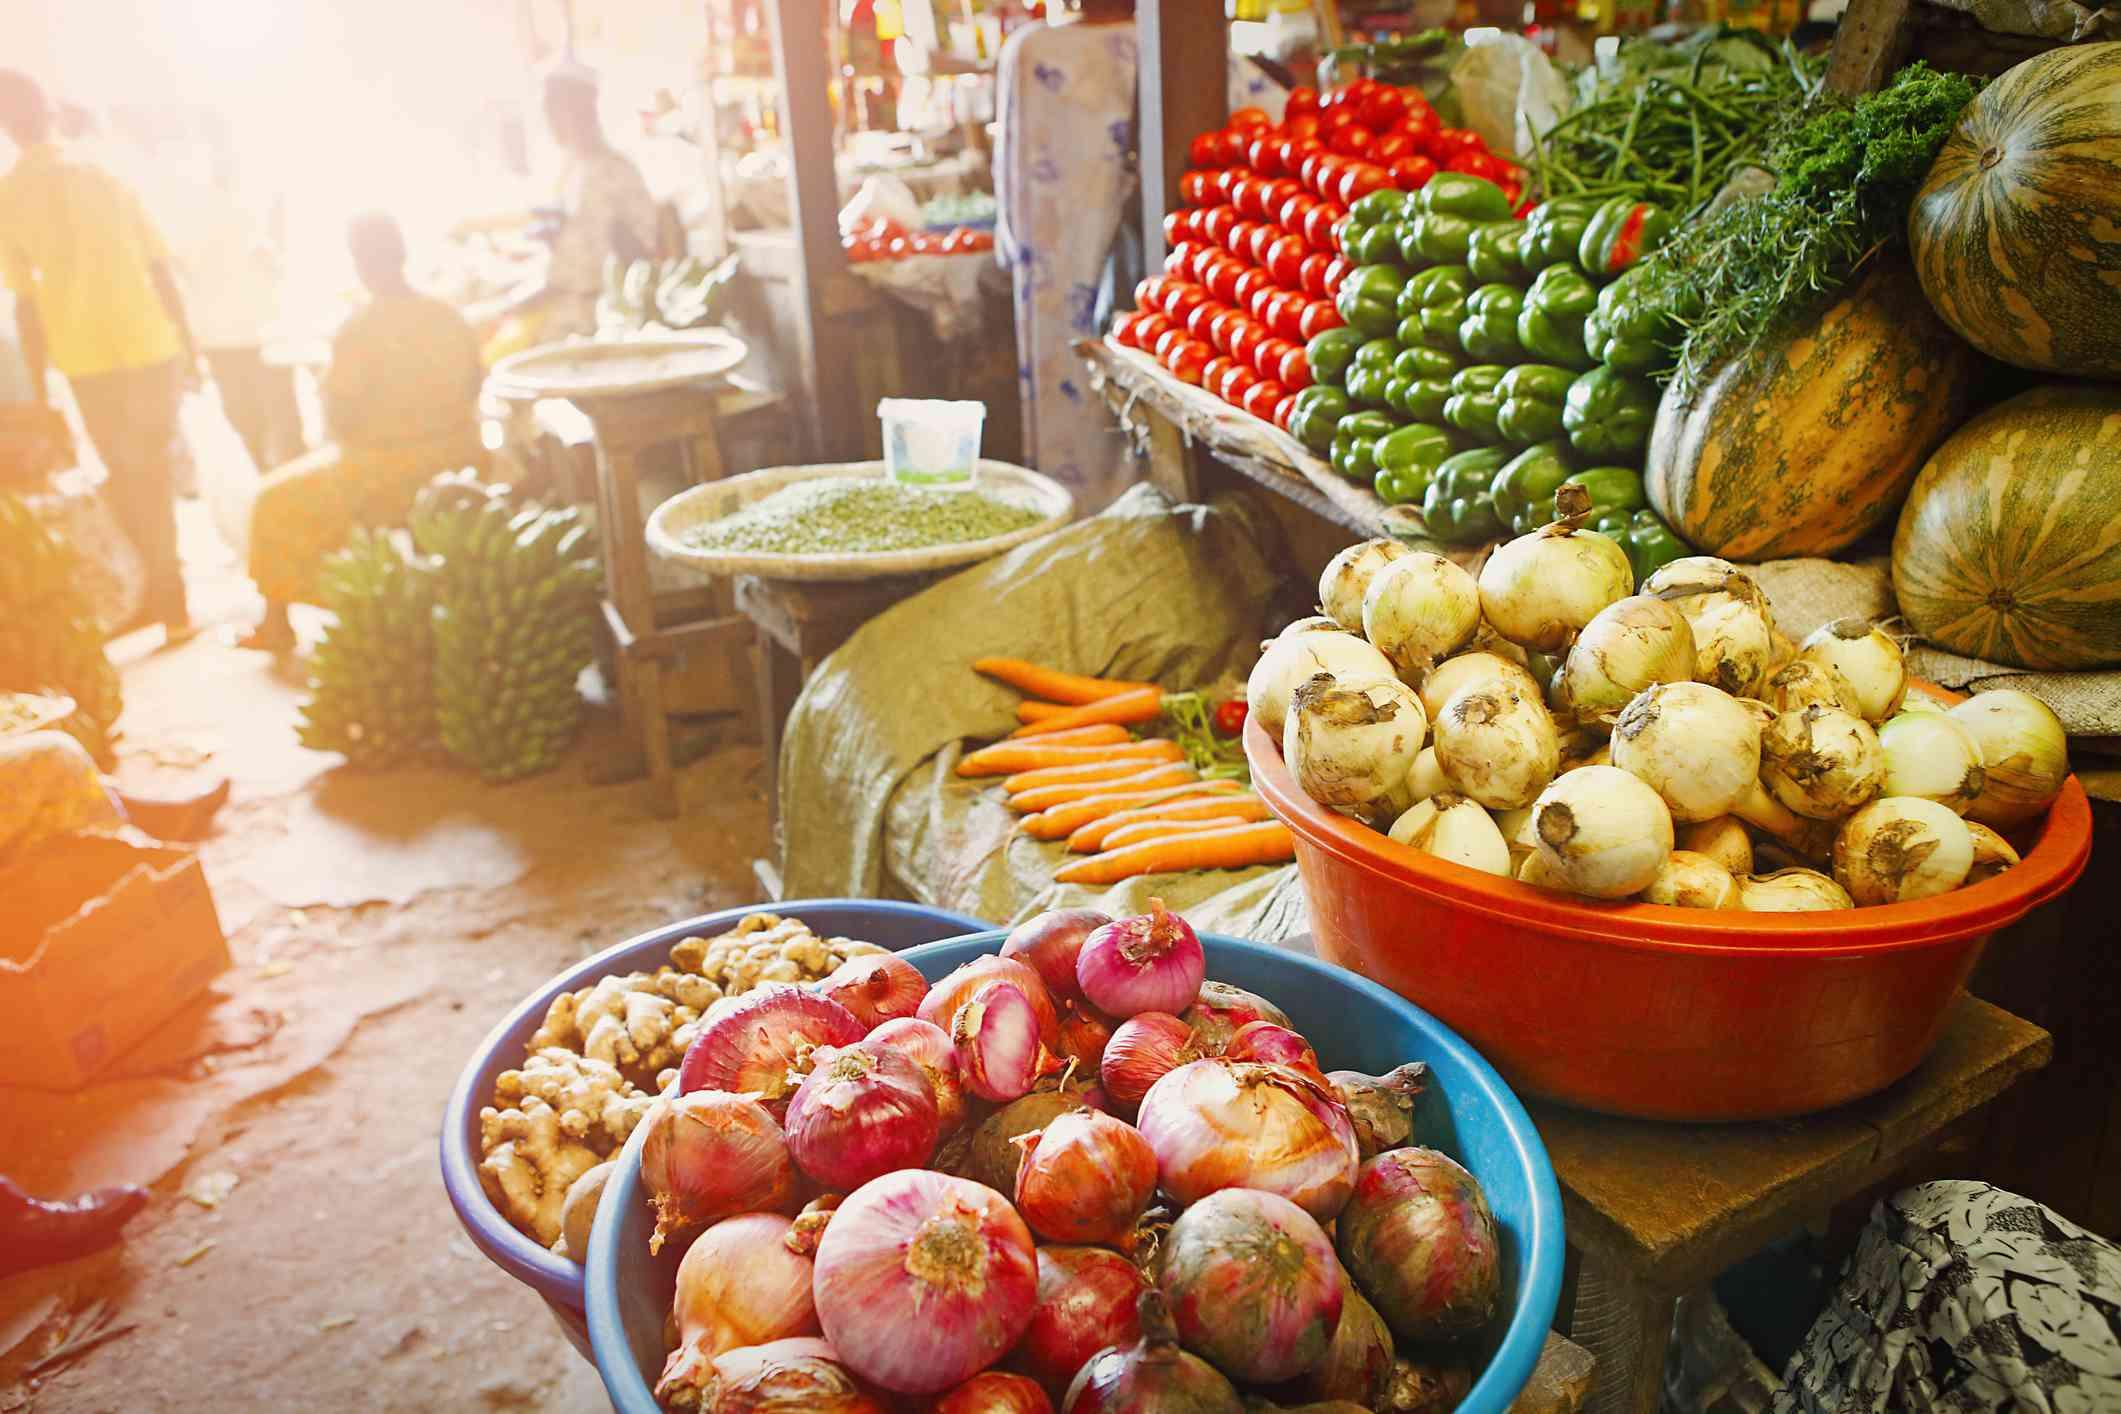 Vegetable stall at Kimironko Market, Kigali